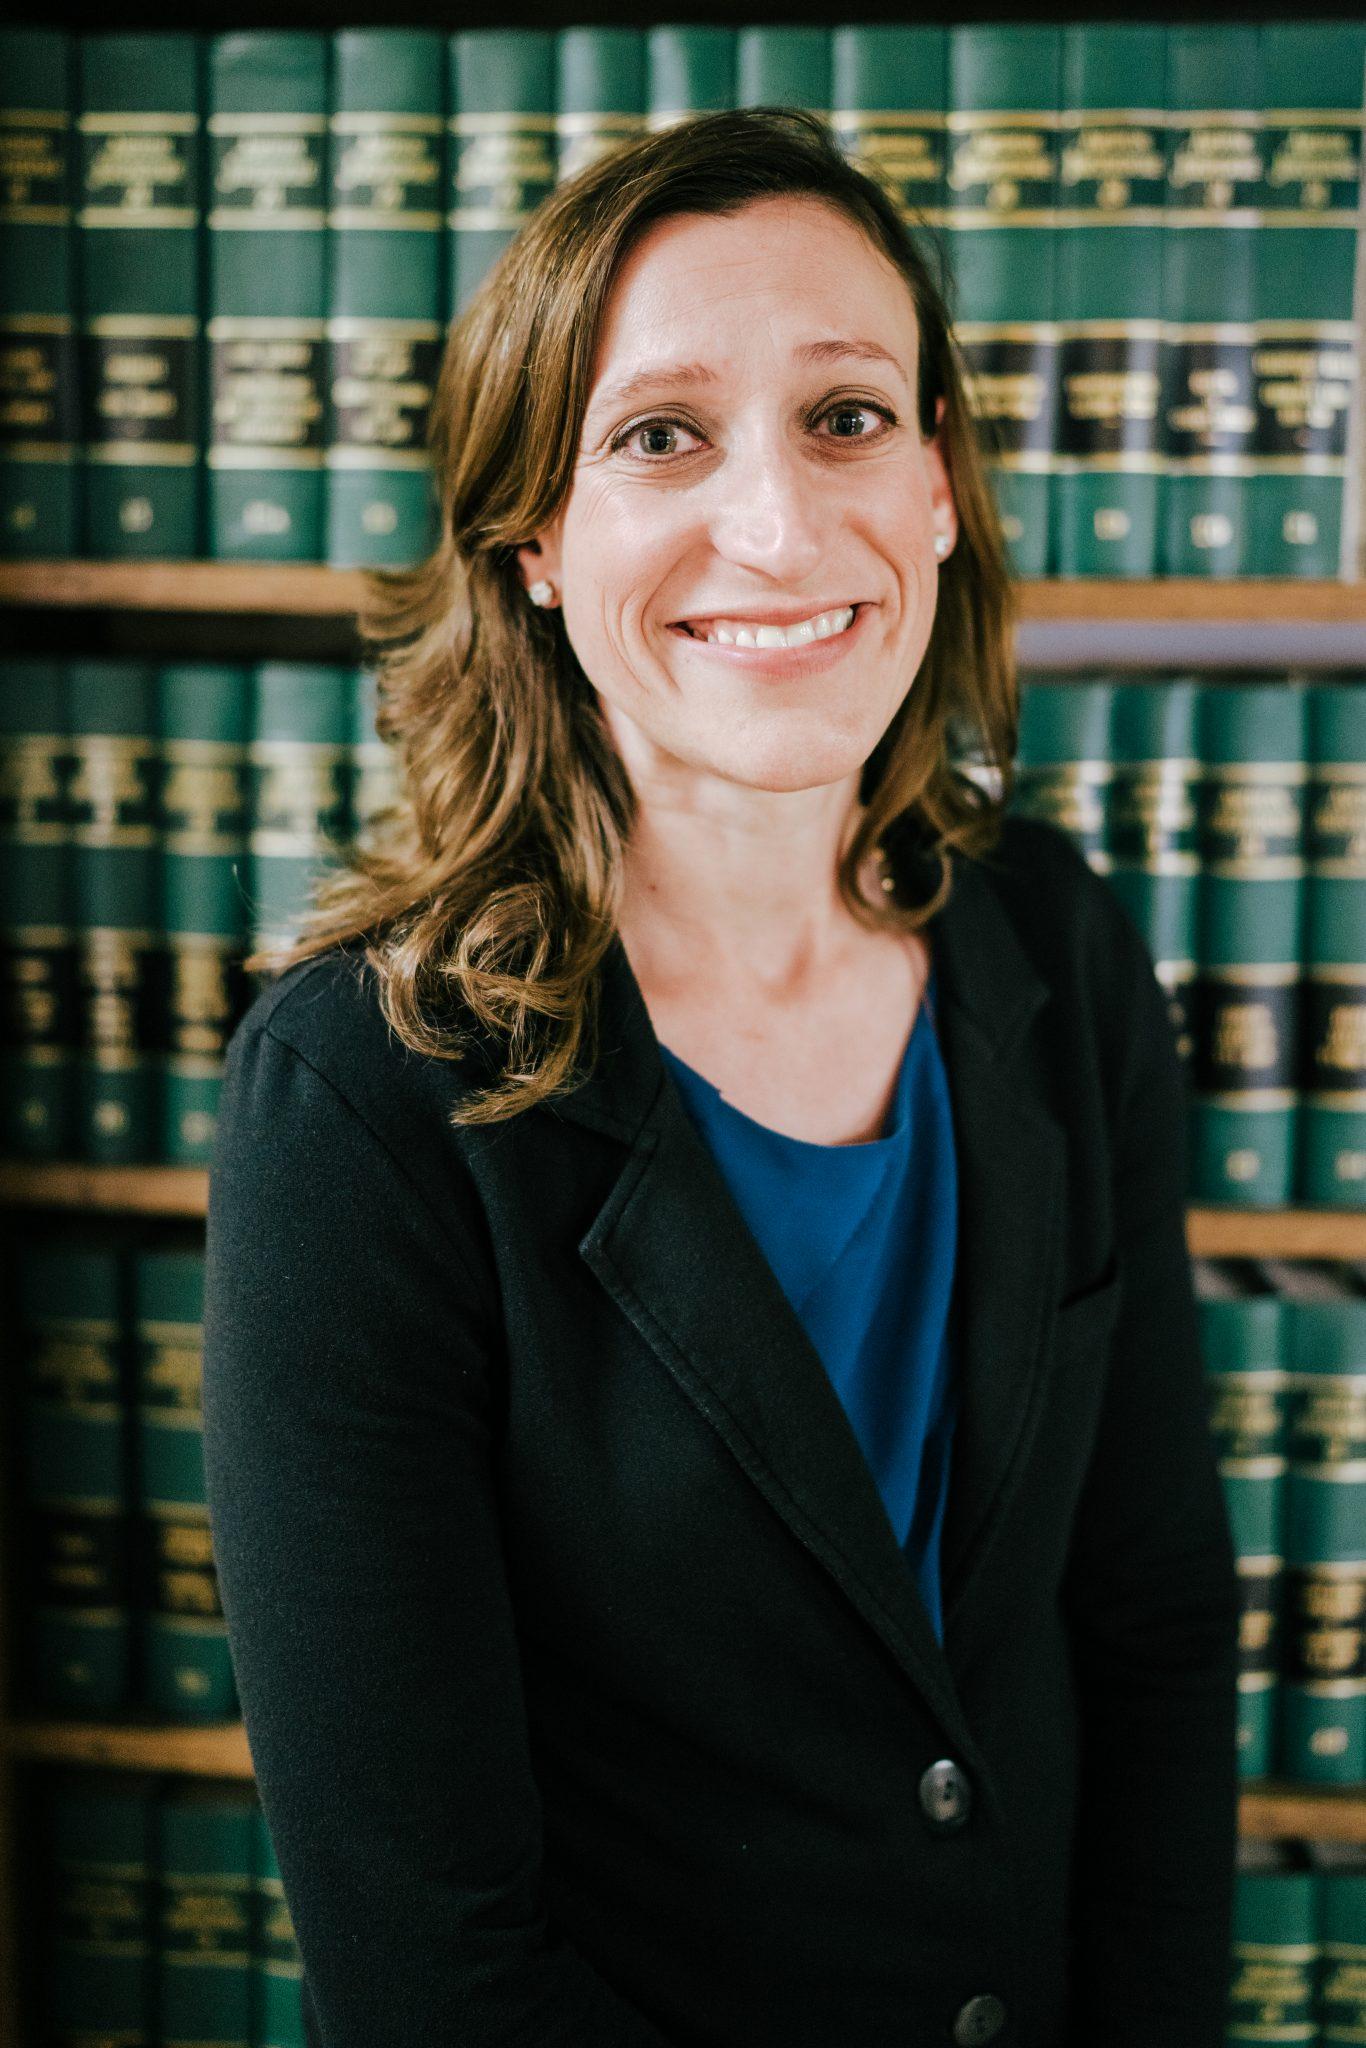 Megan E. Burkhammer